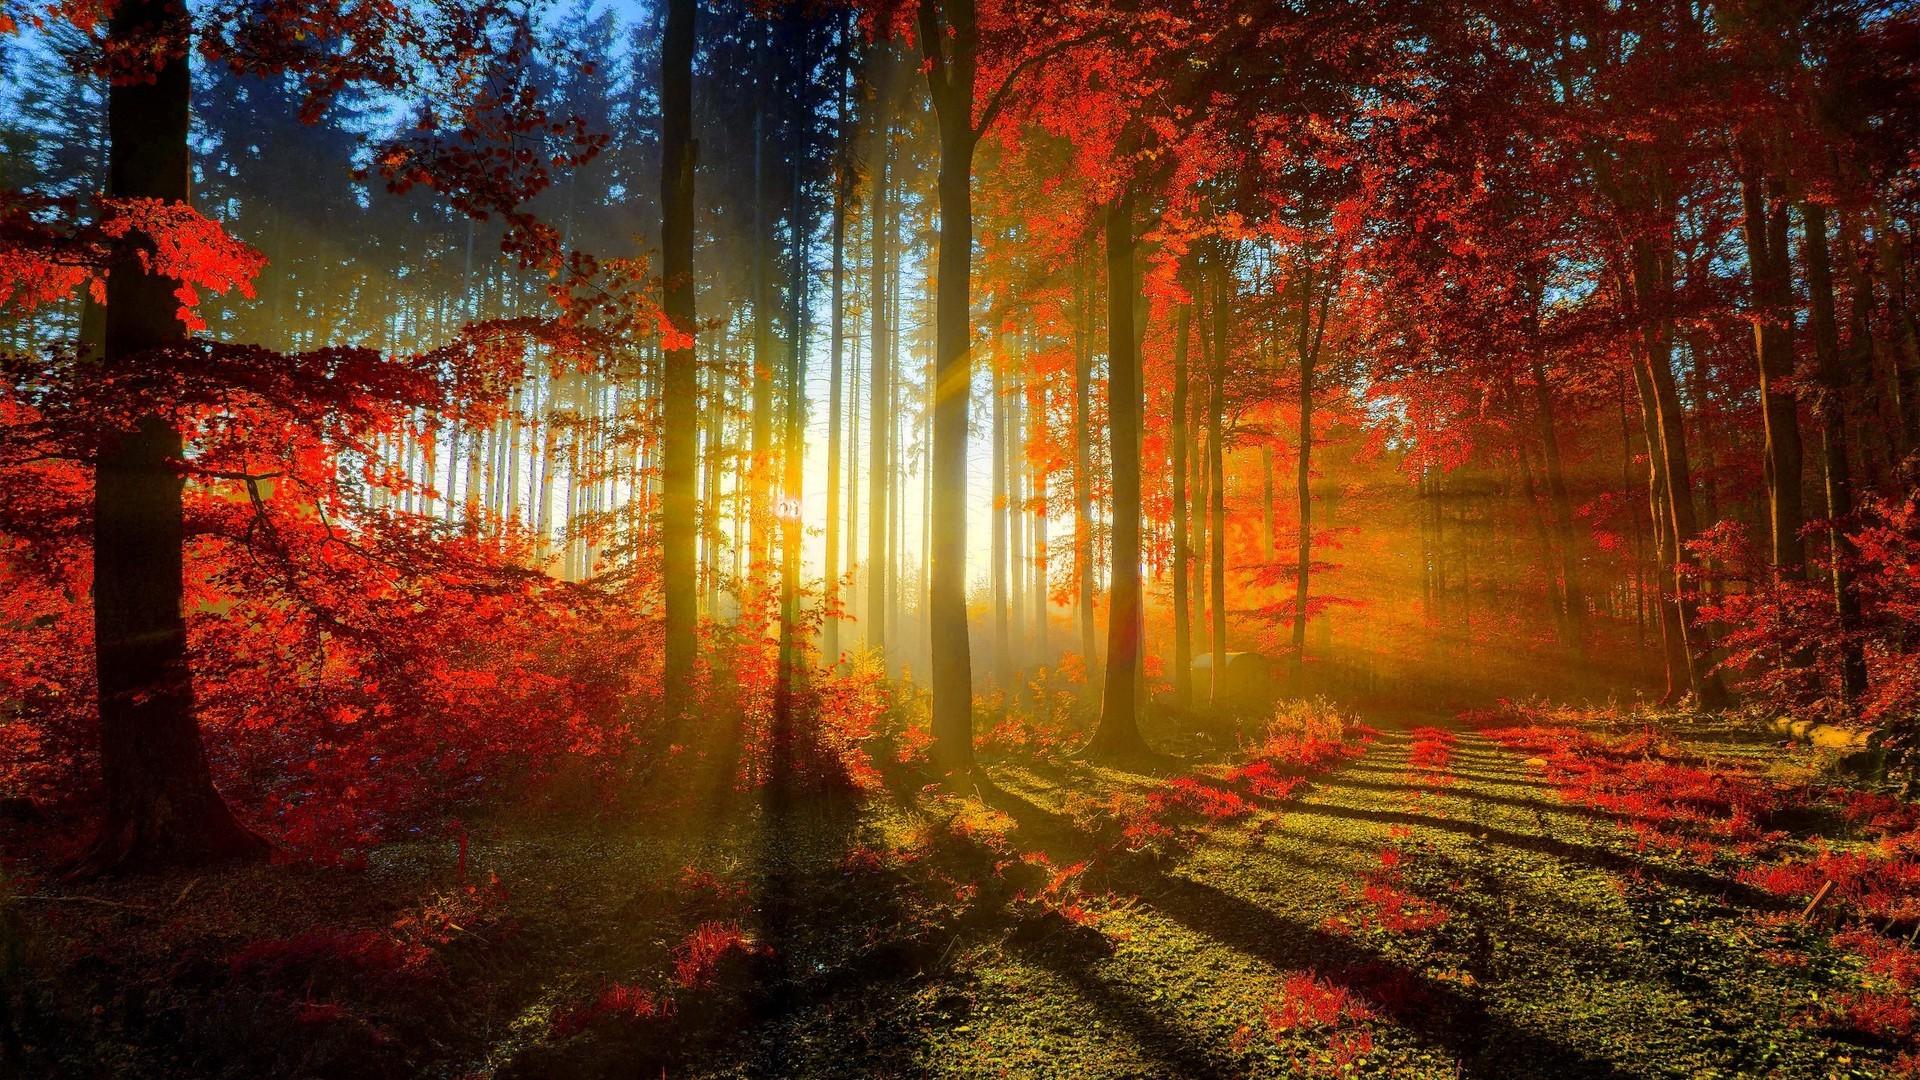 Nature Hd Wallpapers Download 15862 Wallpaper Wallpaper hd 1920x1080